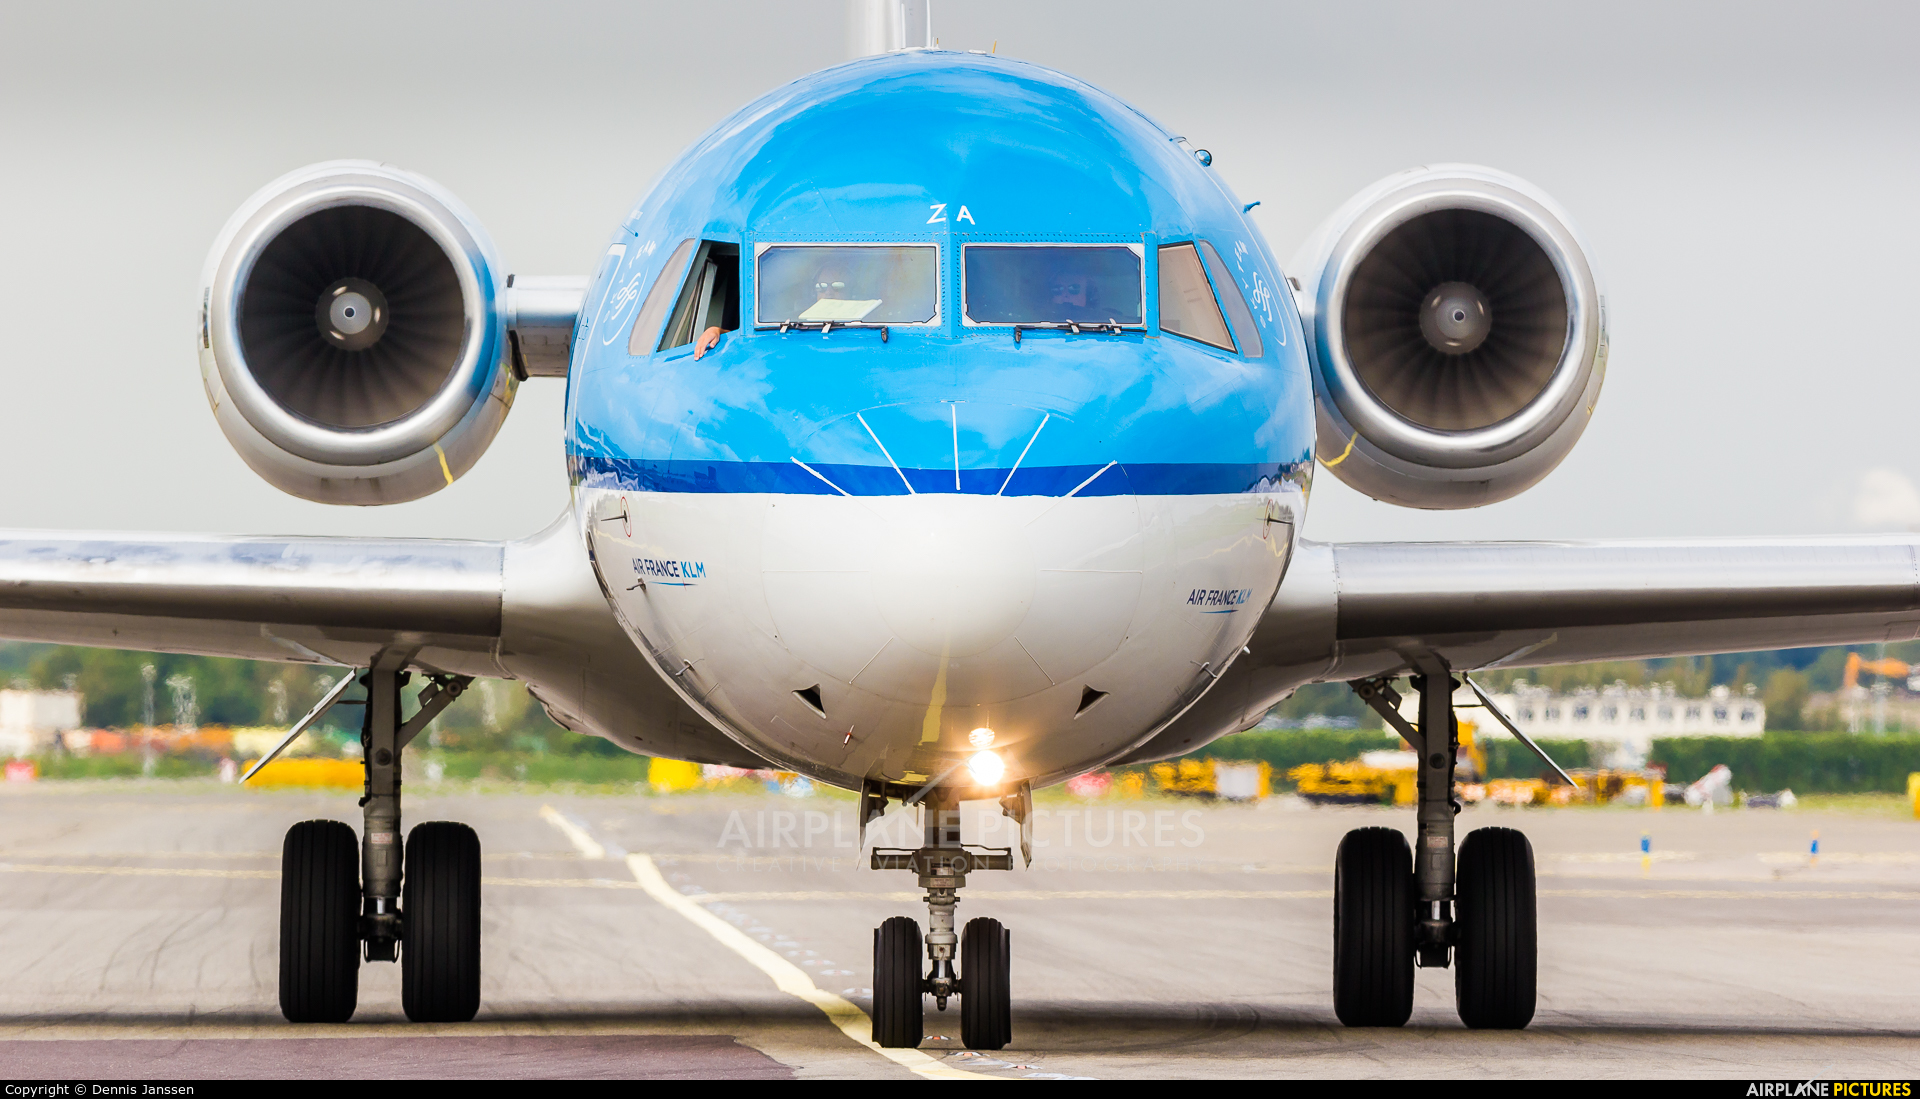 KLM Cityhopper PH-KZA aircraft at Amsterdam - Schiphol